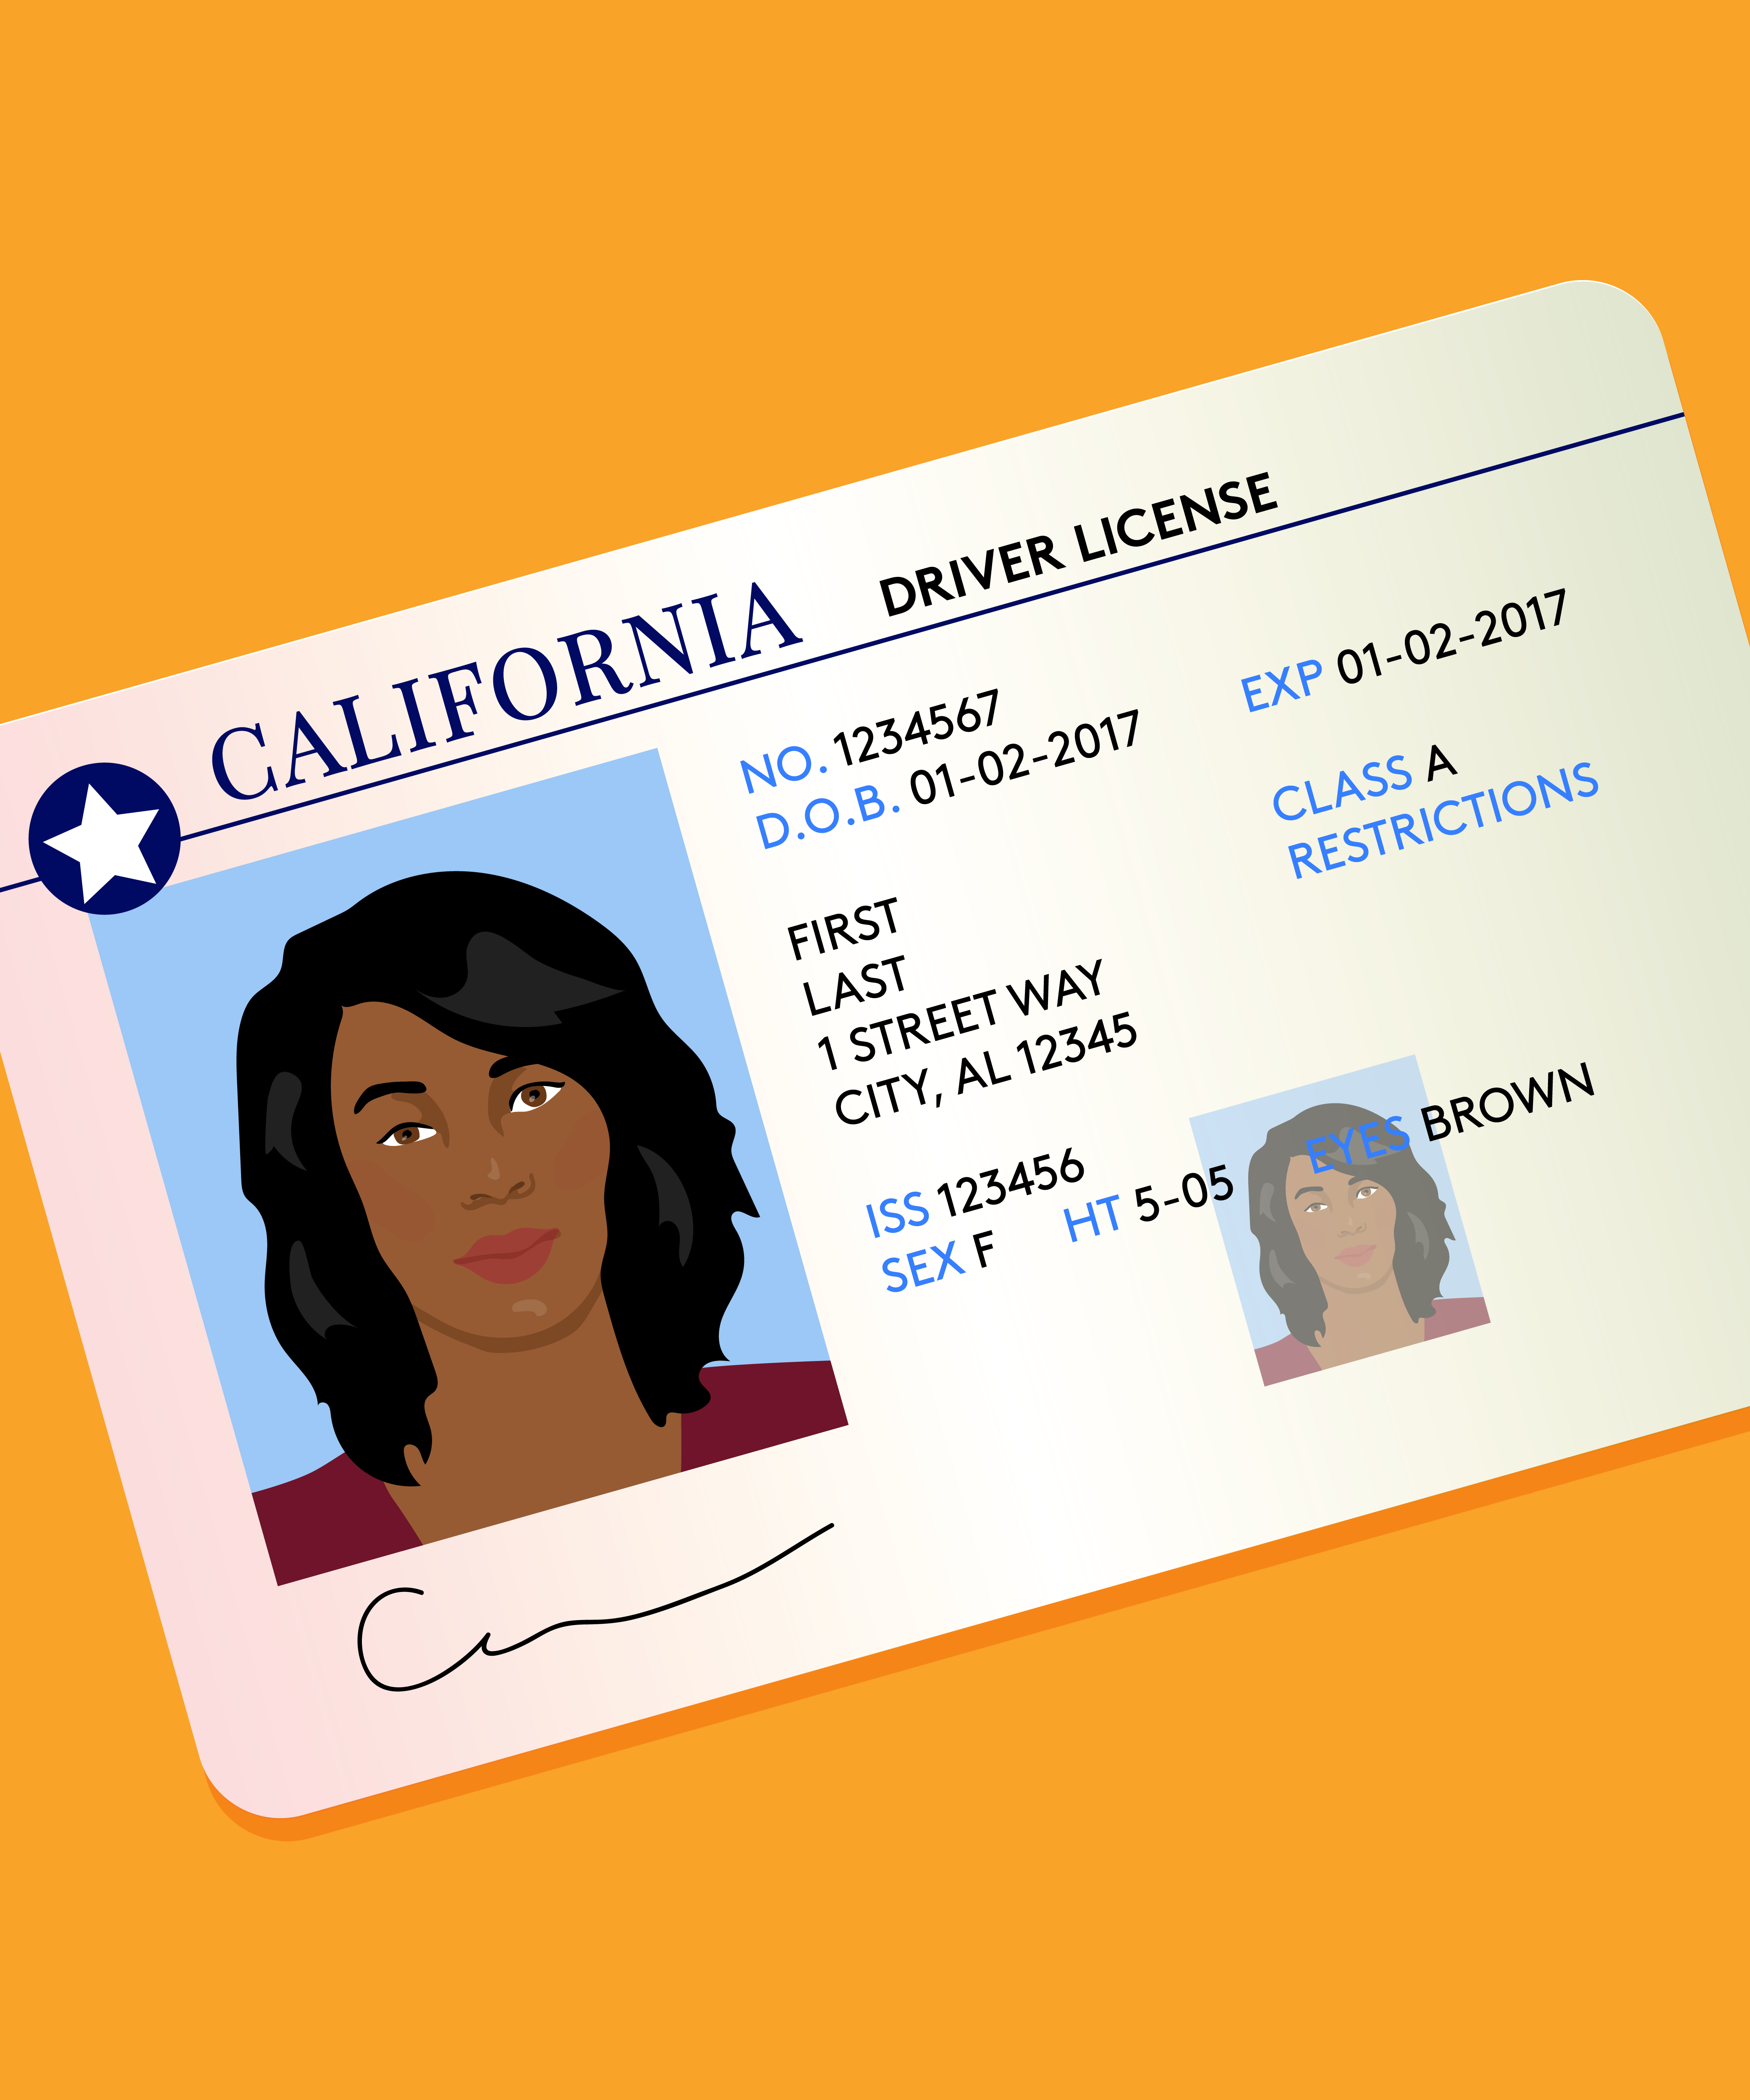 Good Drivers License Photo